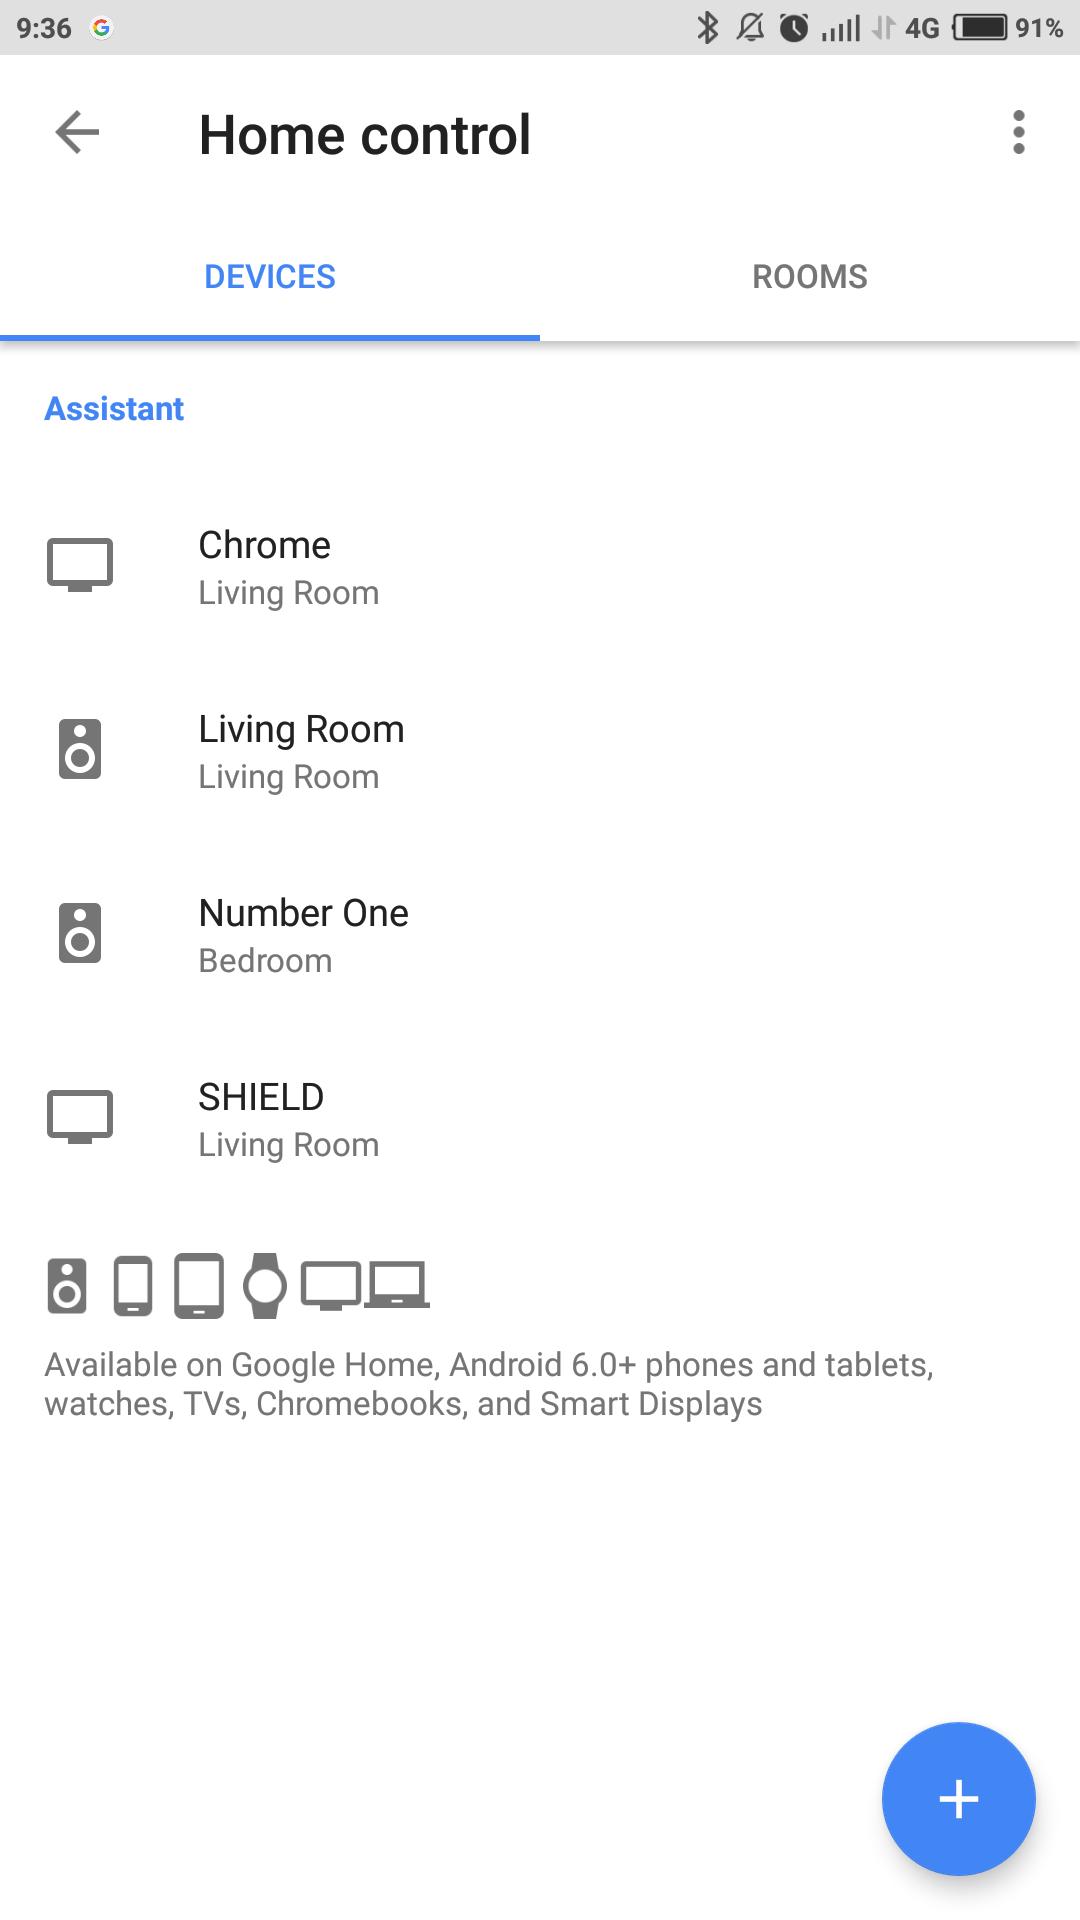 Yeelight colour will not work with Google home - Yeelight LED Bulb